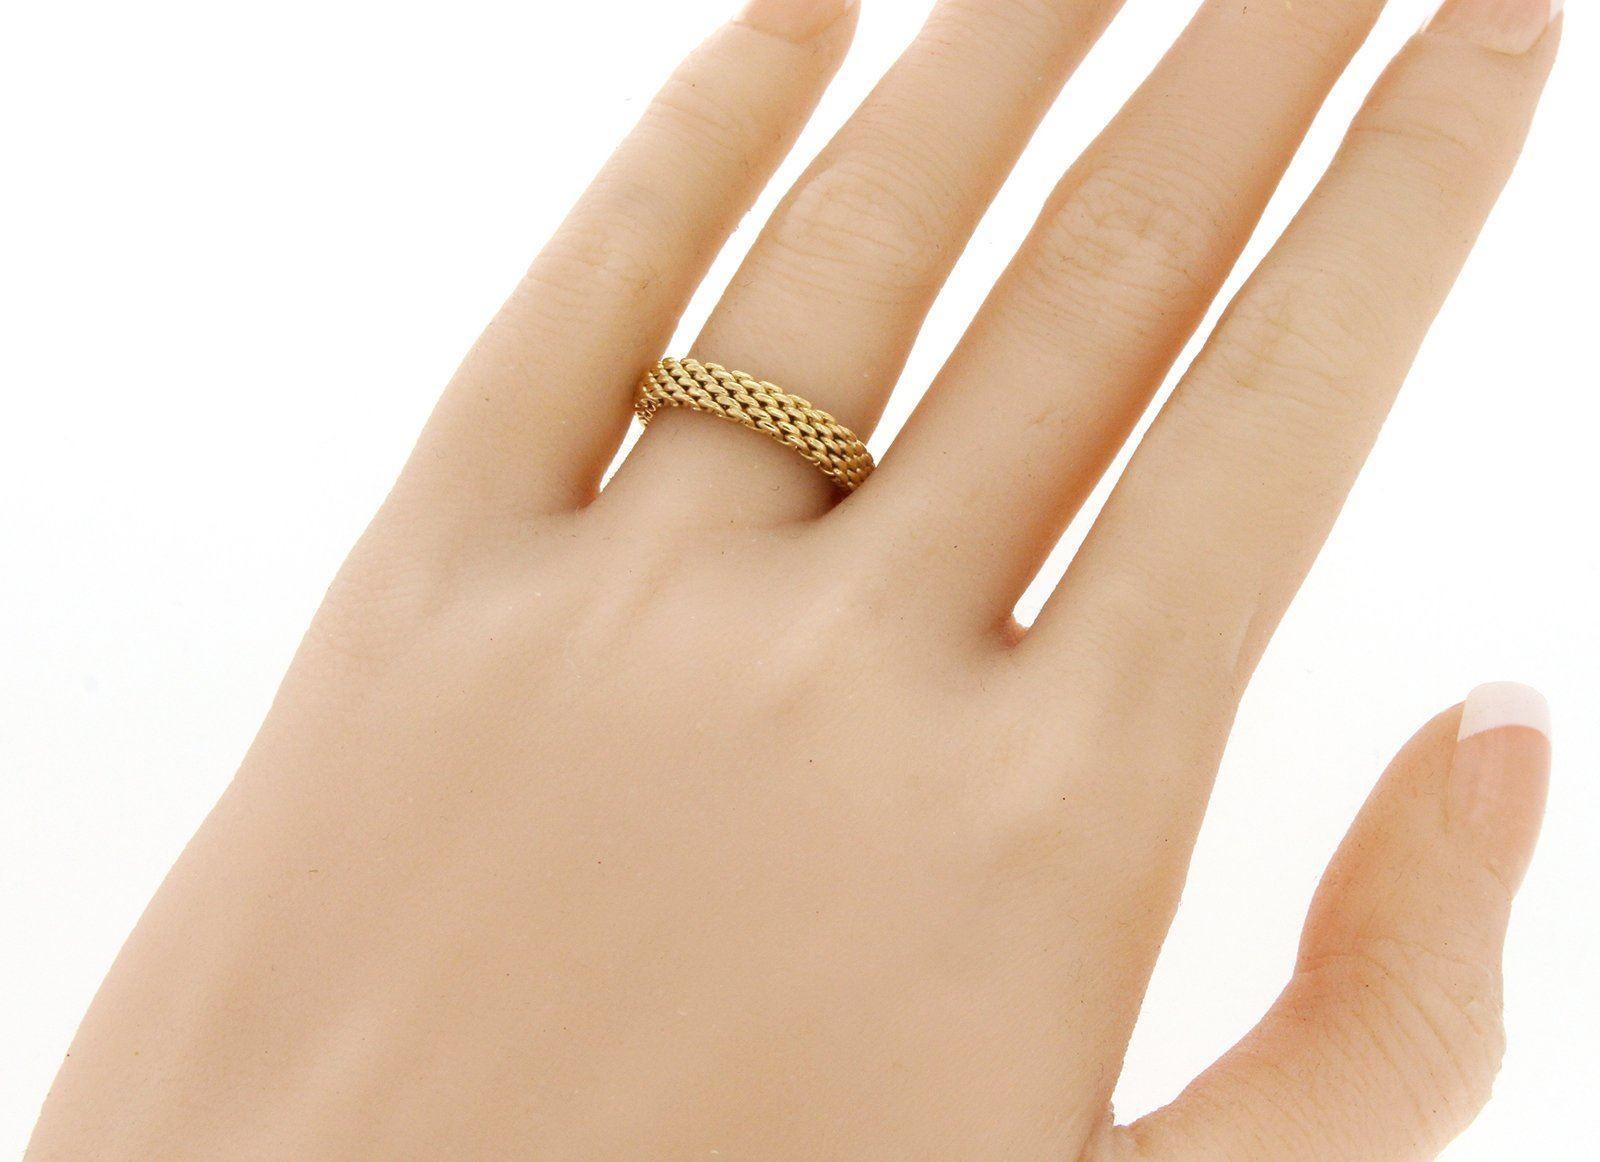 e1613f86f Tiffany and Co. 18 Karat Yellow Gold Somerset Narrow Mesh Band Ring For  Sale at 1stdibs